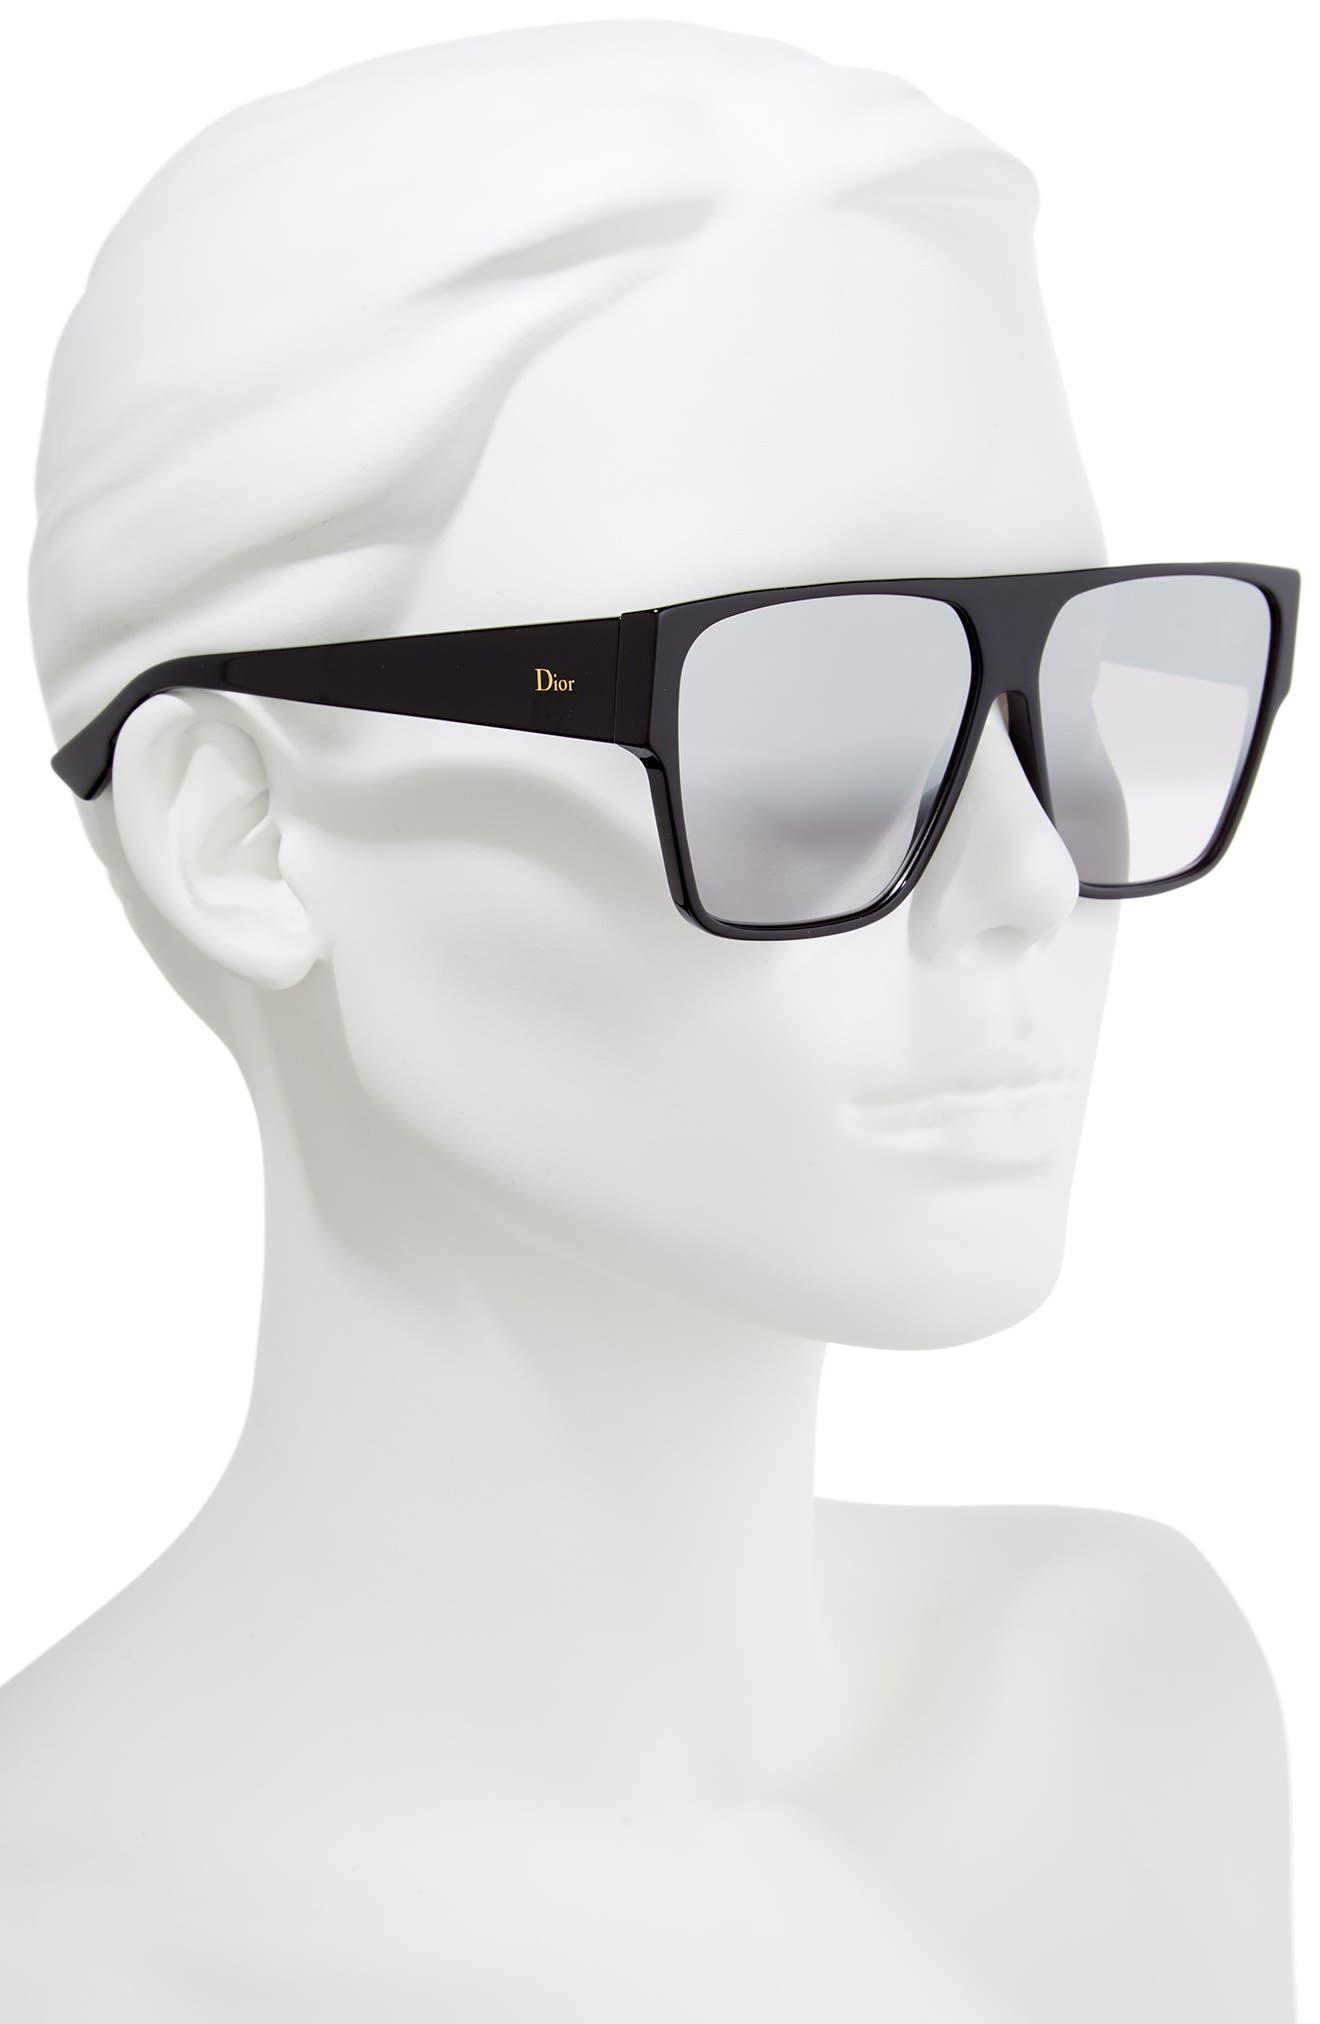 DIOR, 62mm Flat Top Square Sunglasses, Alternate thumbnail 2, color, BLACK